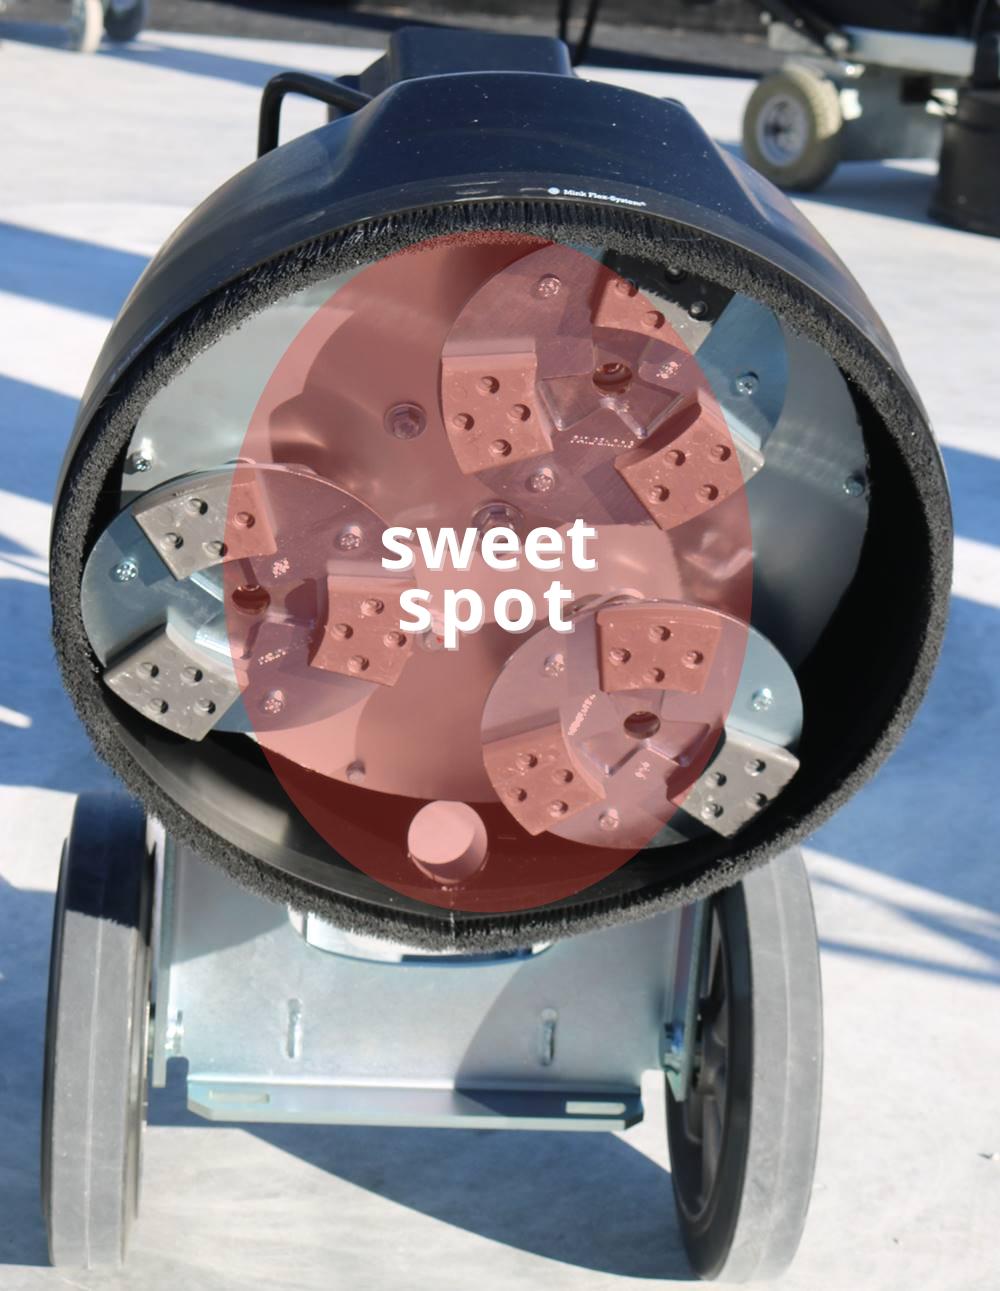 Determining a Concrete Grinder's Sweet Spot